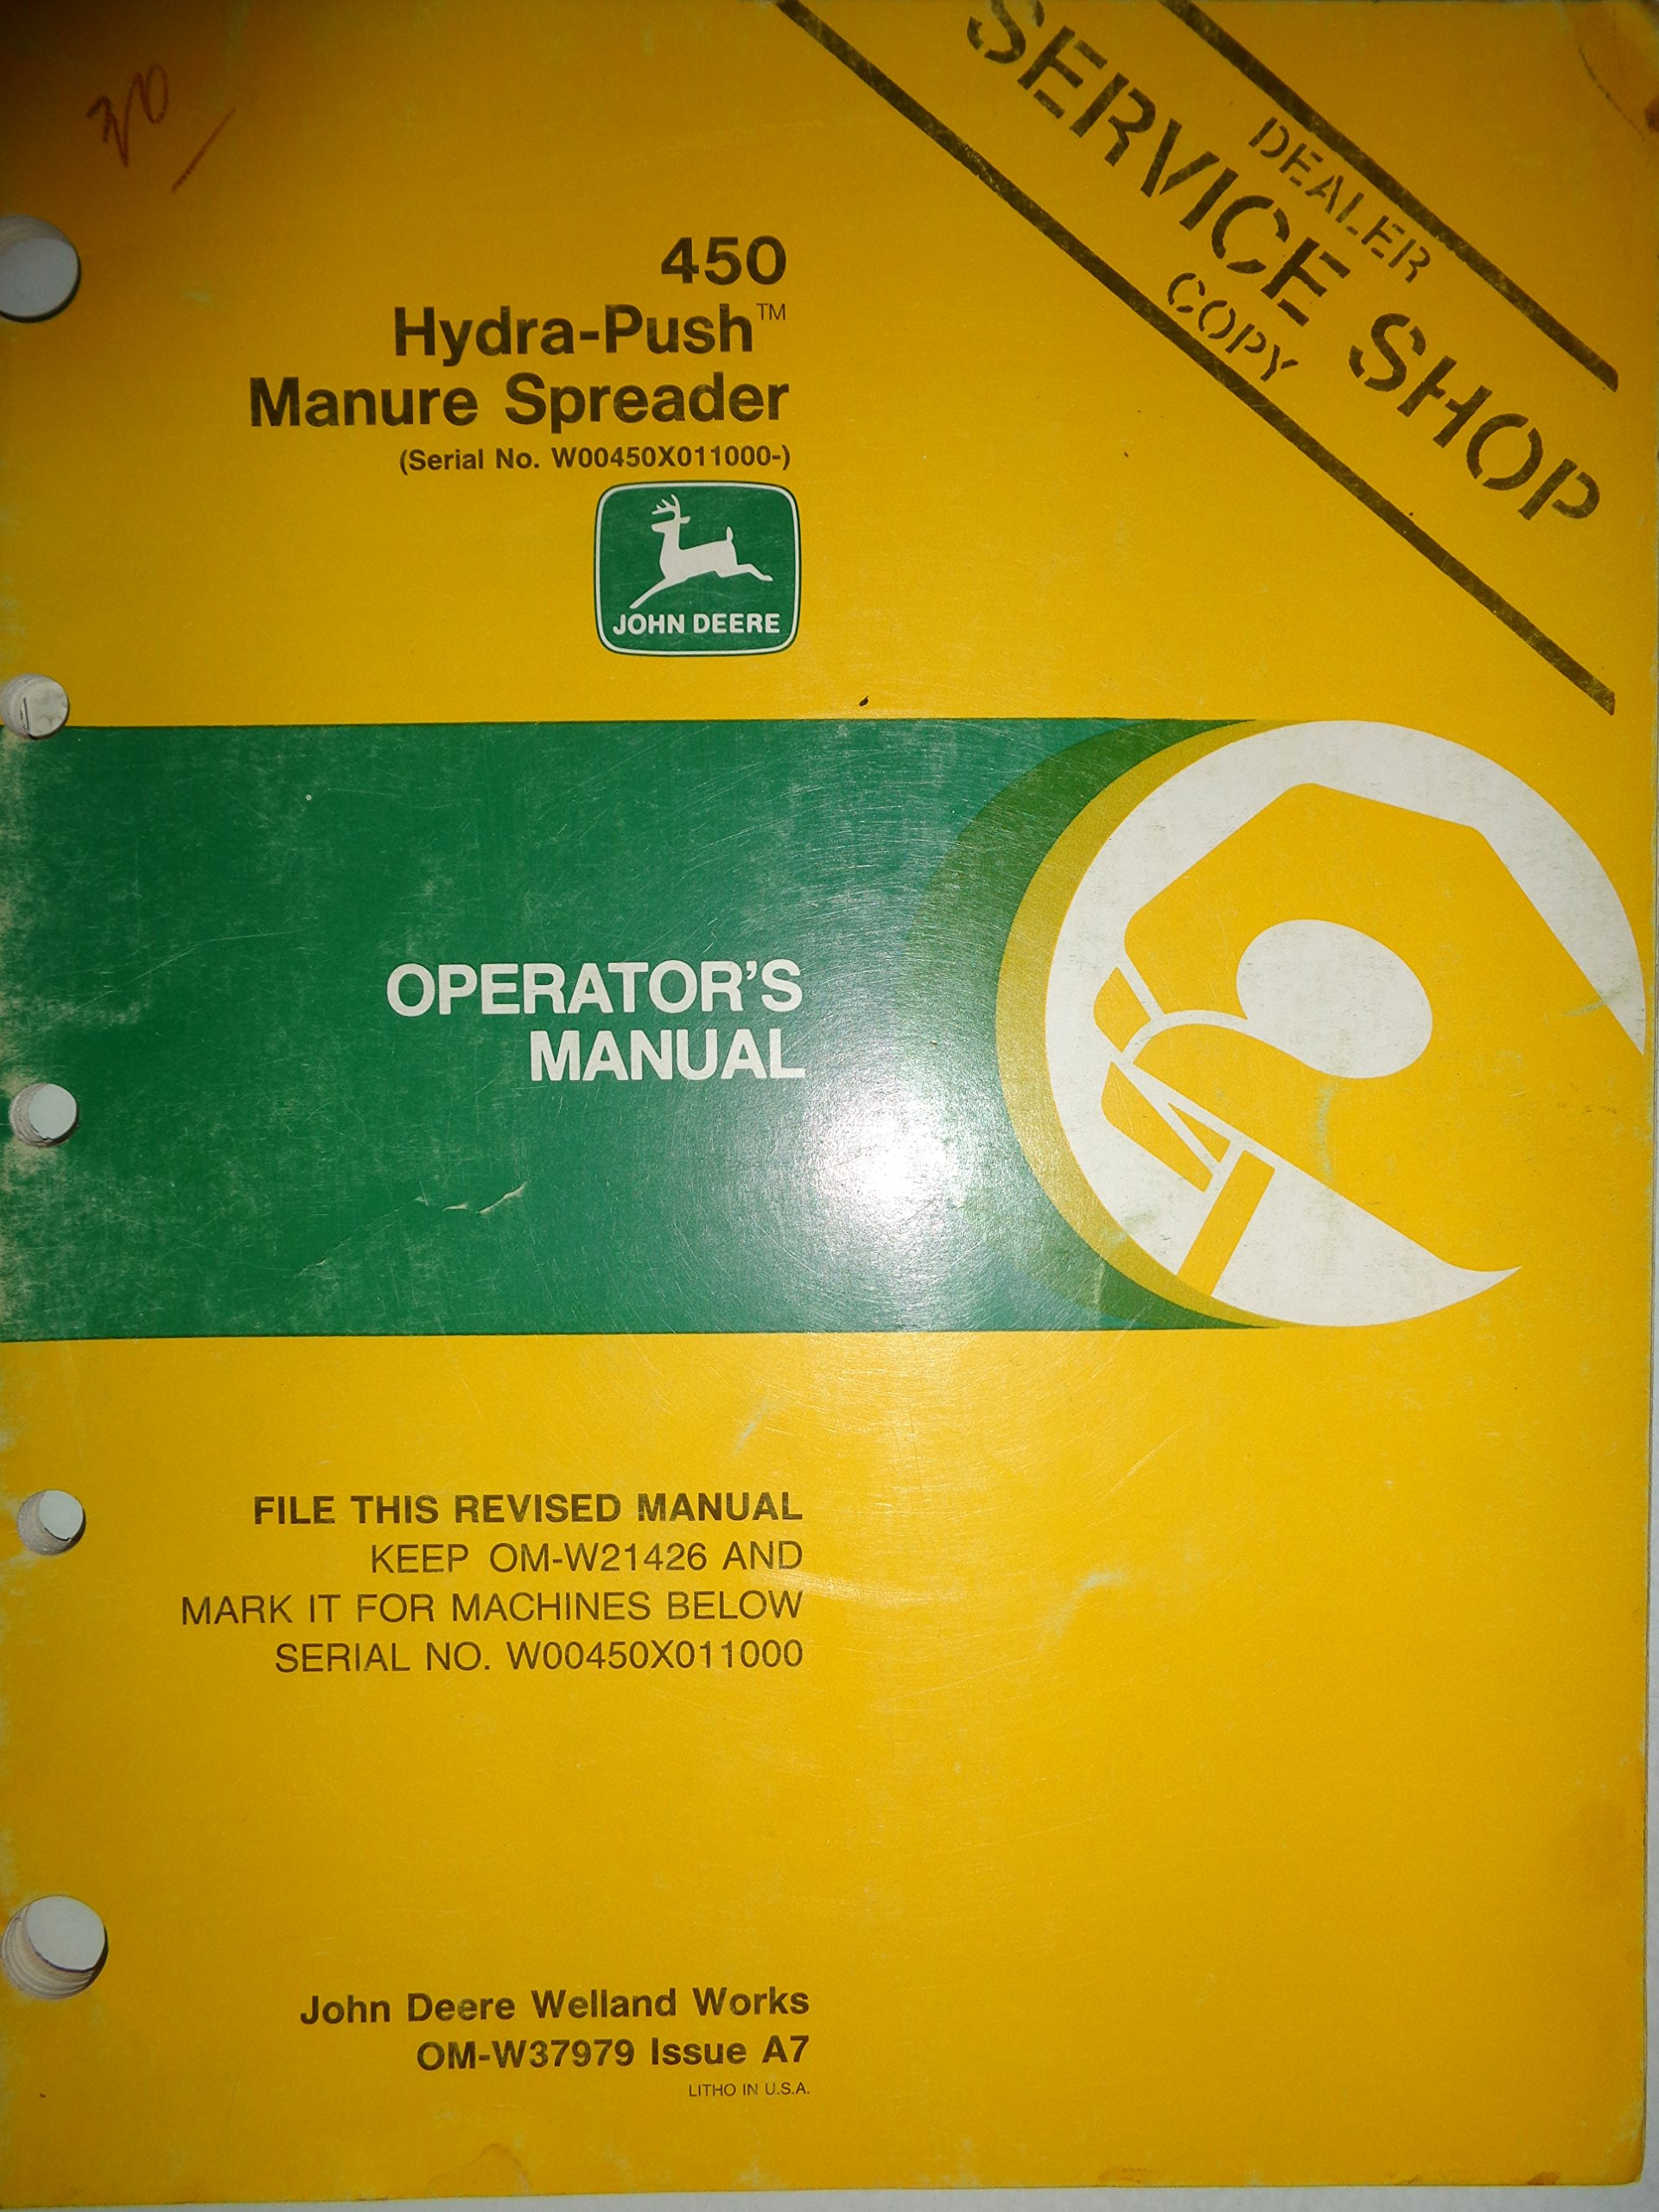 John Deere 450 Manure Spreader Operators Manual 6/87 A7: Deere: Amazon.com:  Books